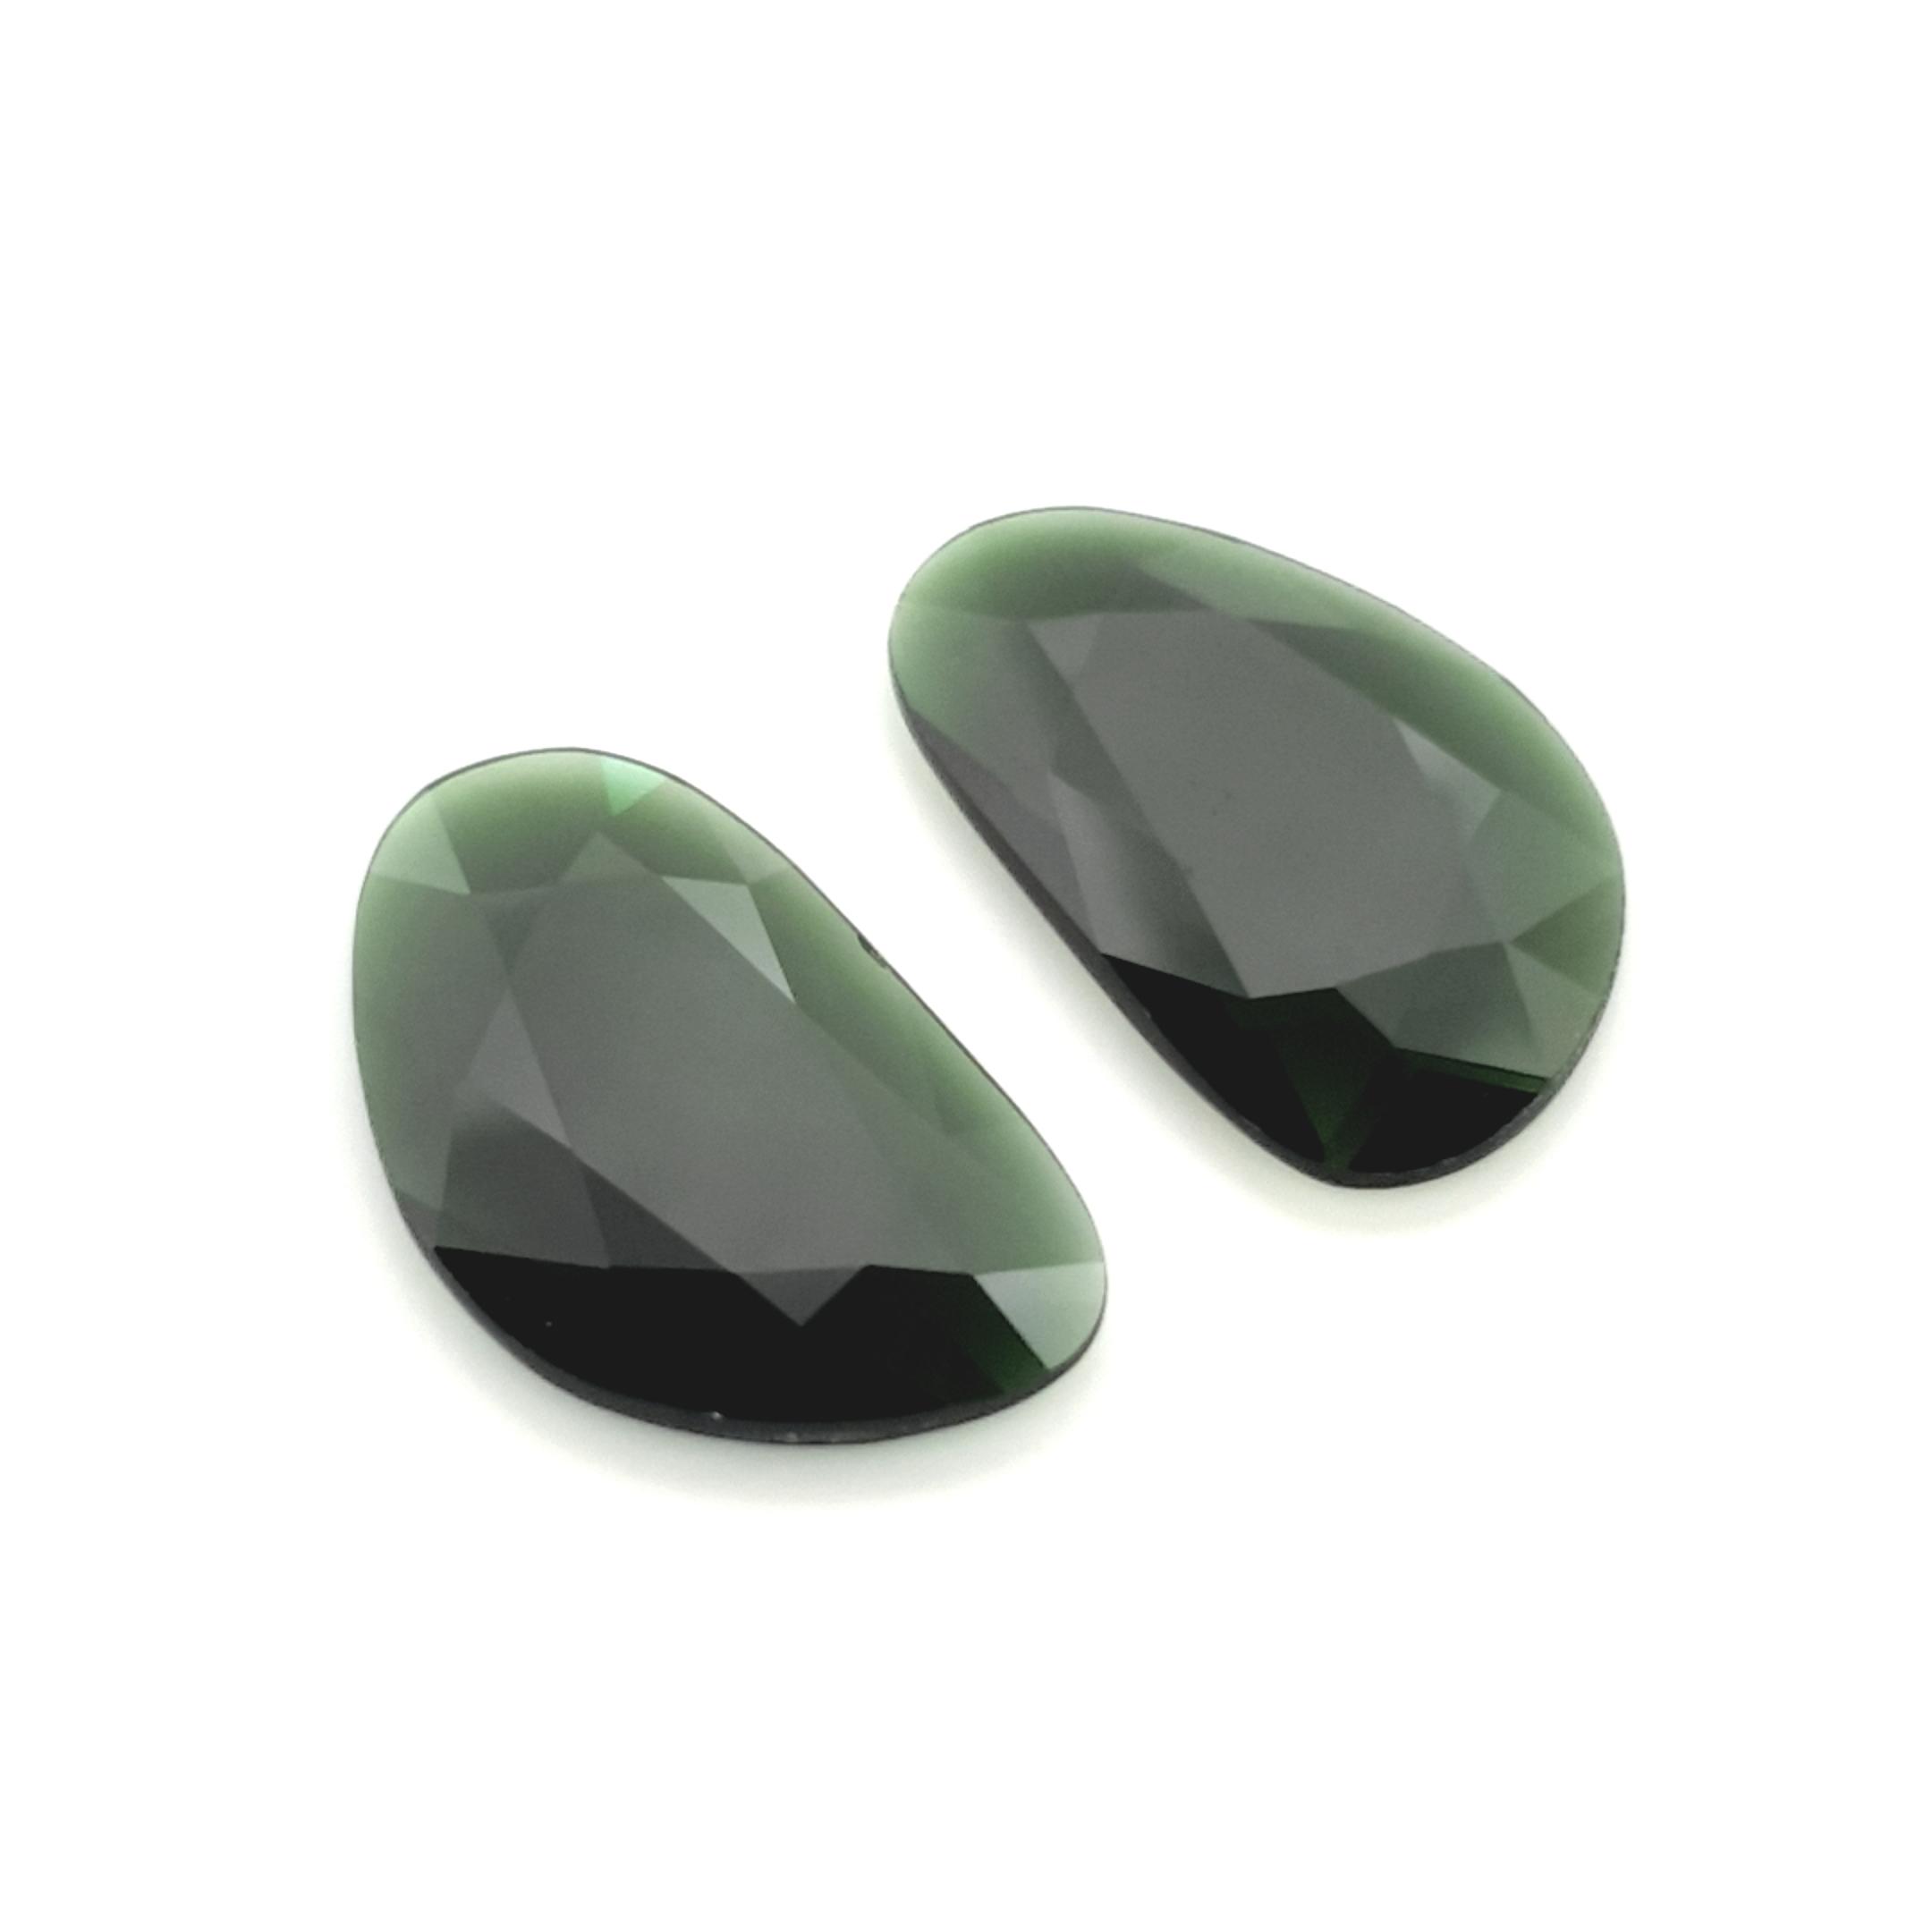 8,38ct.Pair Imperial Green Tourmalin DoubleRoseCut TMC08C3 ClaudiaHamann__2021-02-11-18-16-54